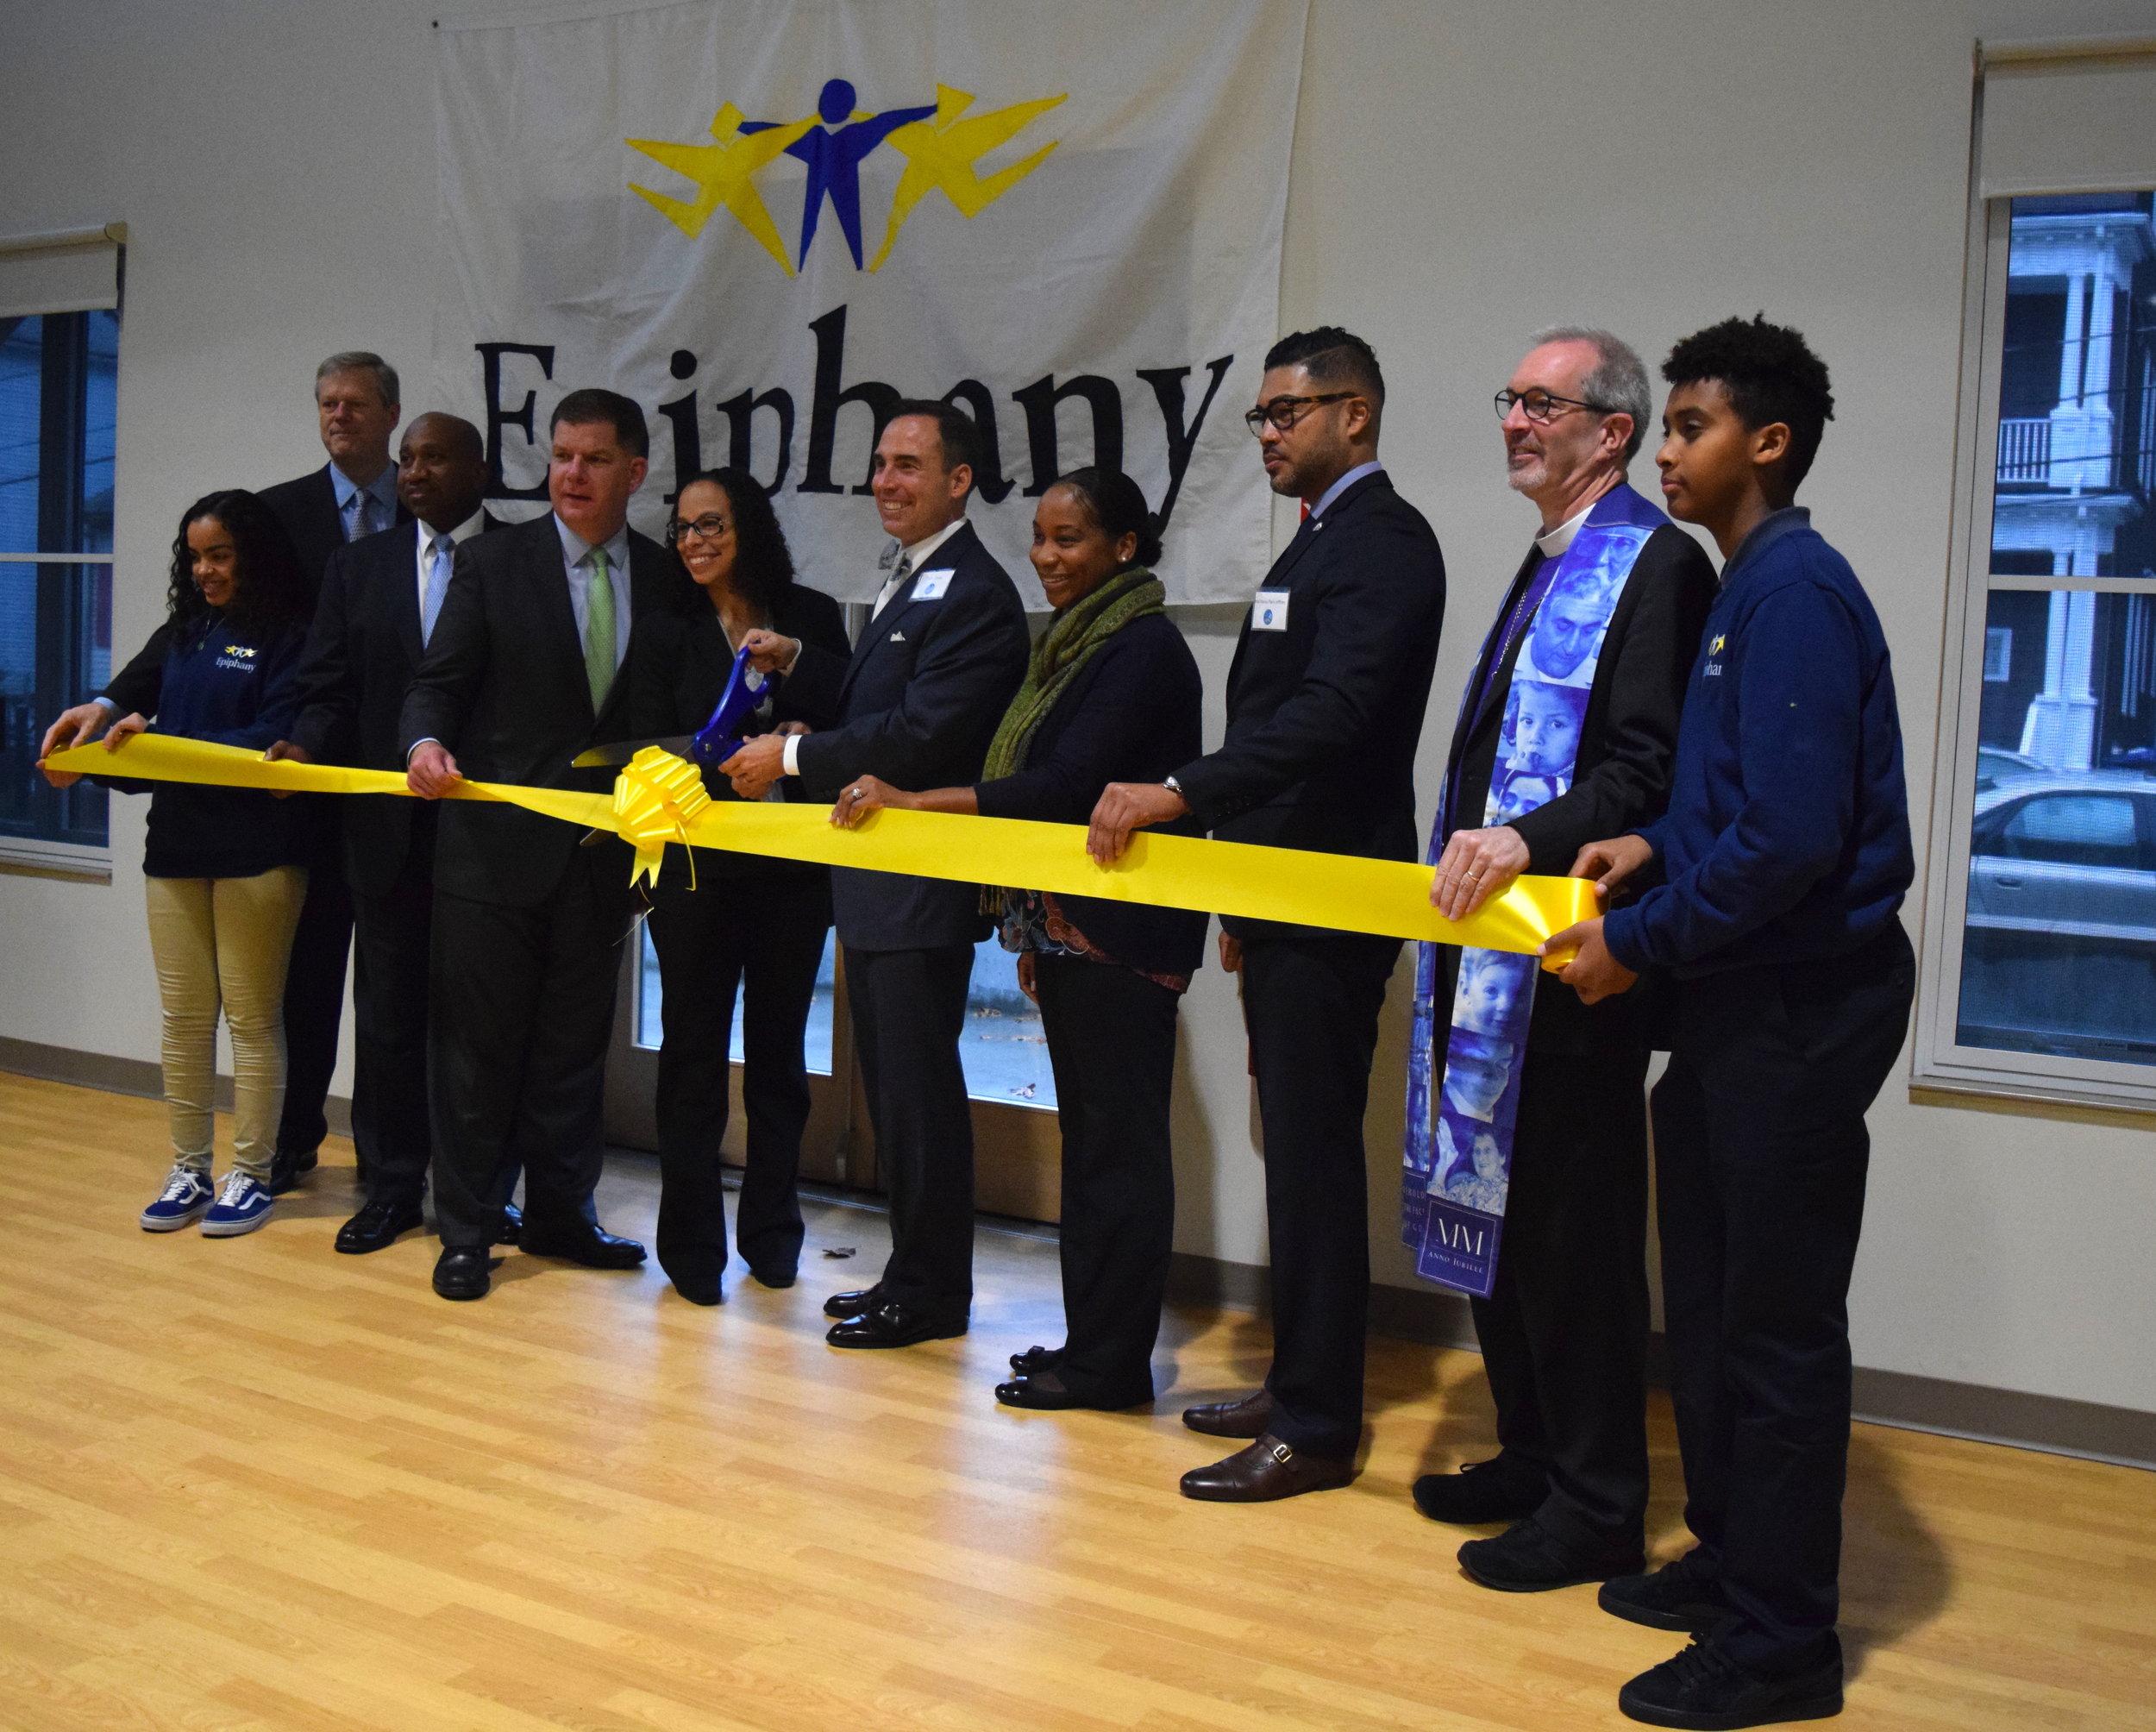 [left to right: Anayah (Epiphany 8th Grader), Governor Baker, Representative Holmes, Mayor Walsh, Dr. Sanchez, Rev. Finley, Councilor Campbell, Mr. Paris Jeffries, Bishop Gates and Romel(Epiphany 8th Grader)]